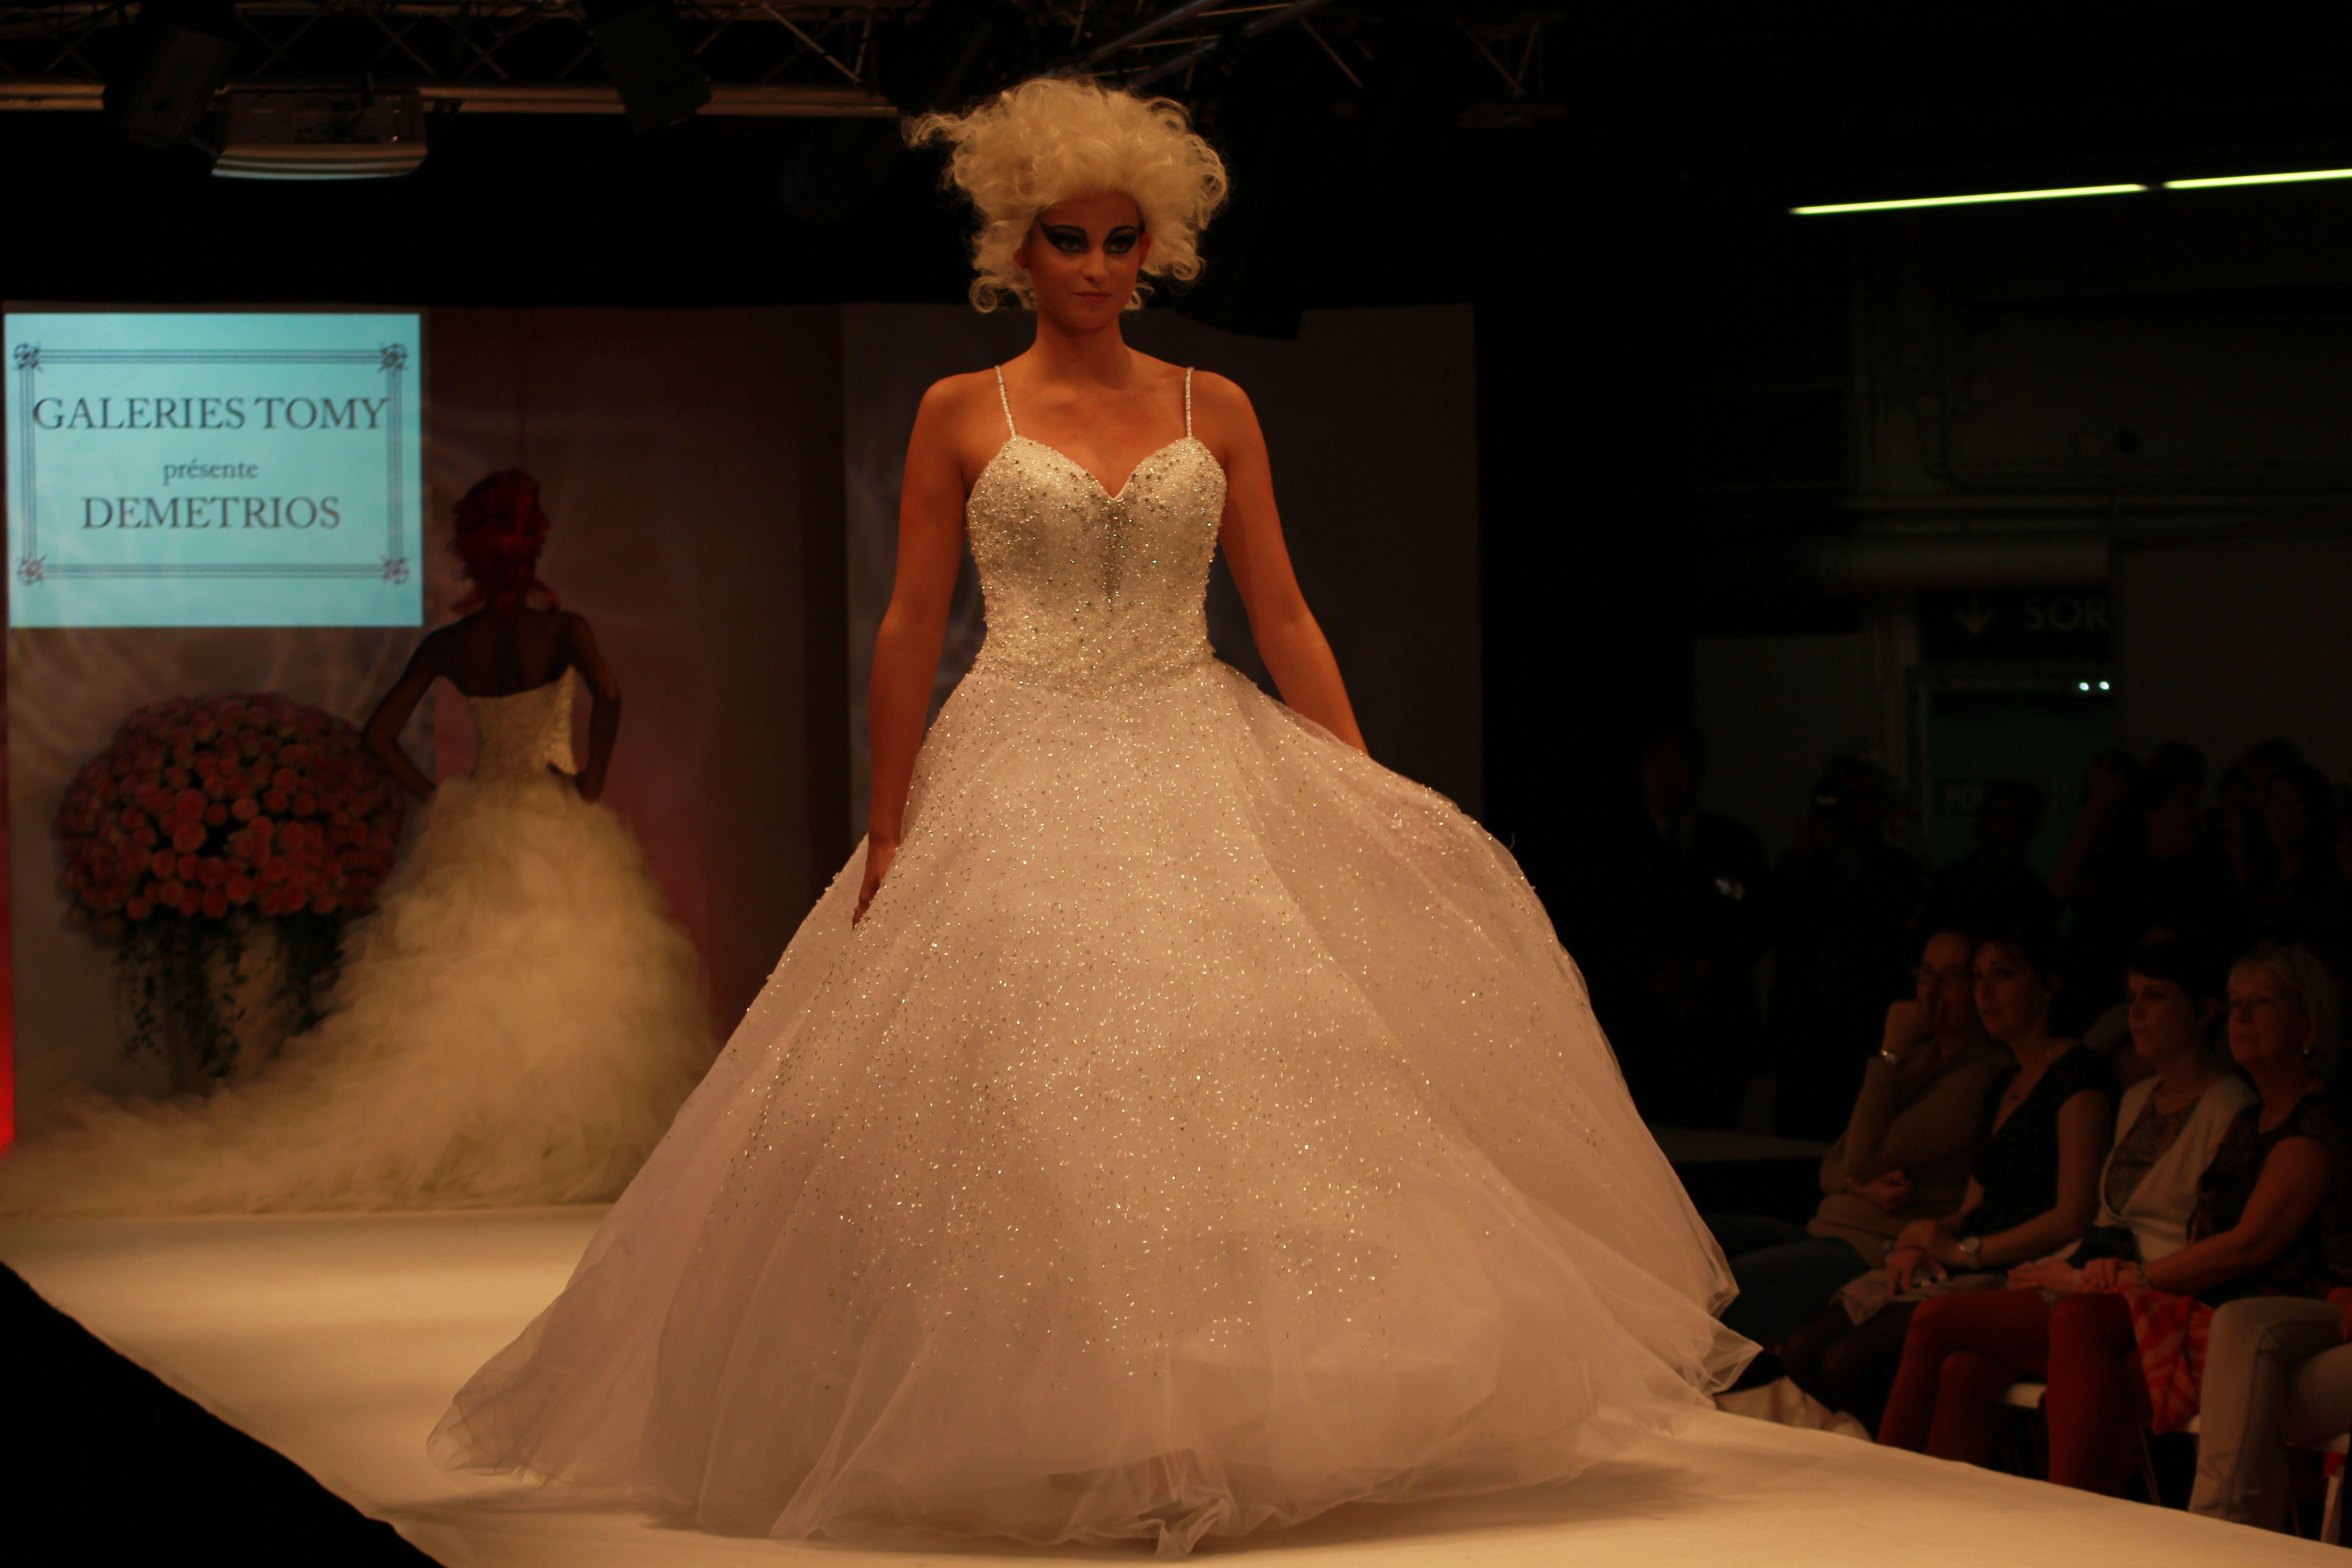 Demetrios, collection 2013-2014. http://www.journaldesfemmes.com/mariage/robe-mariee/robes-de-mariee-salon-du-mariage-et-du-pacs/robe-princesse-demetrios.shtml